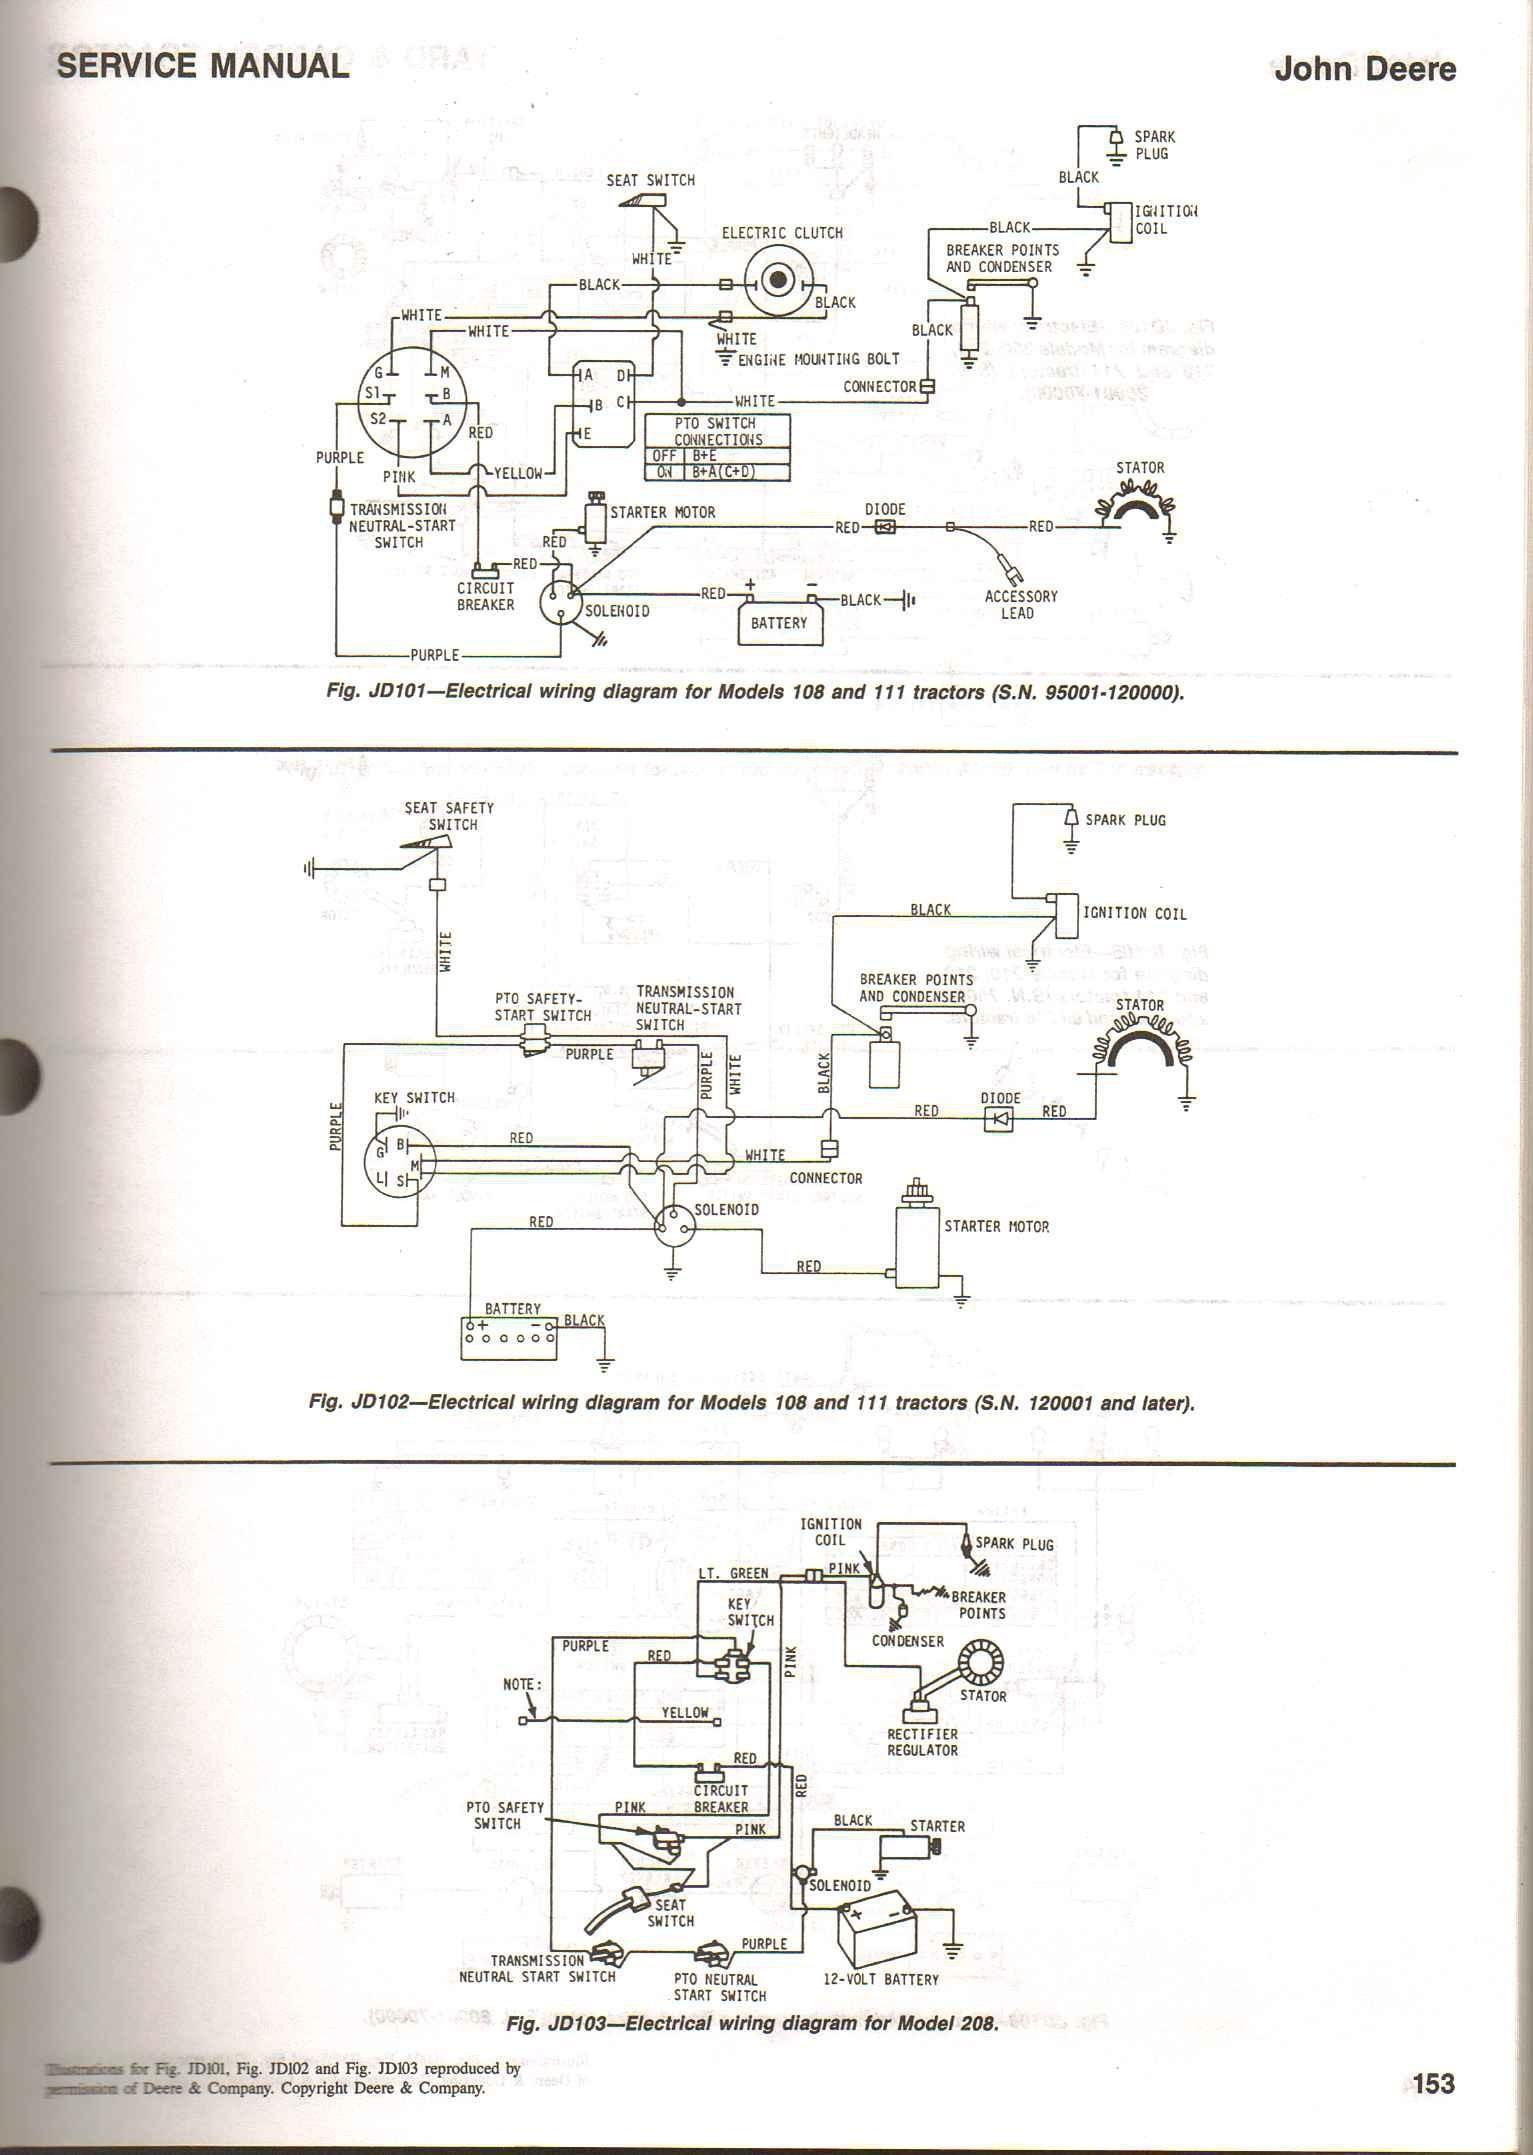 hight resolution of john deere gator 6x4 wiring diagram online wiring diagramjohn deere gator 6x4 wiring diagram free picture